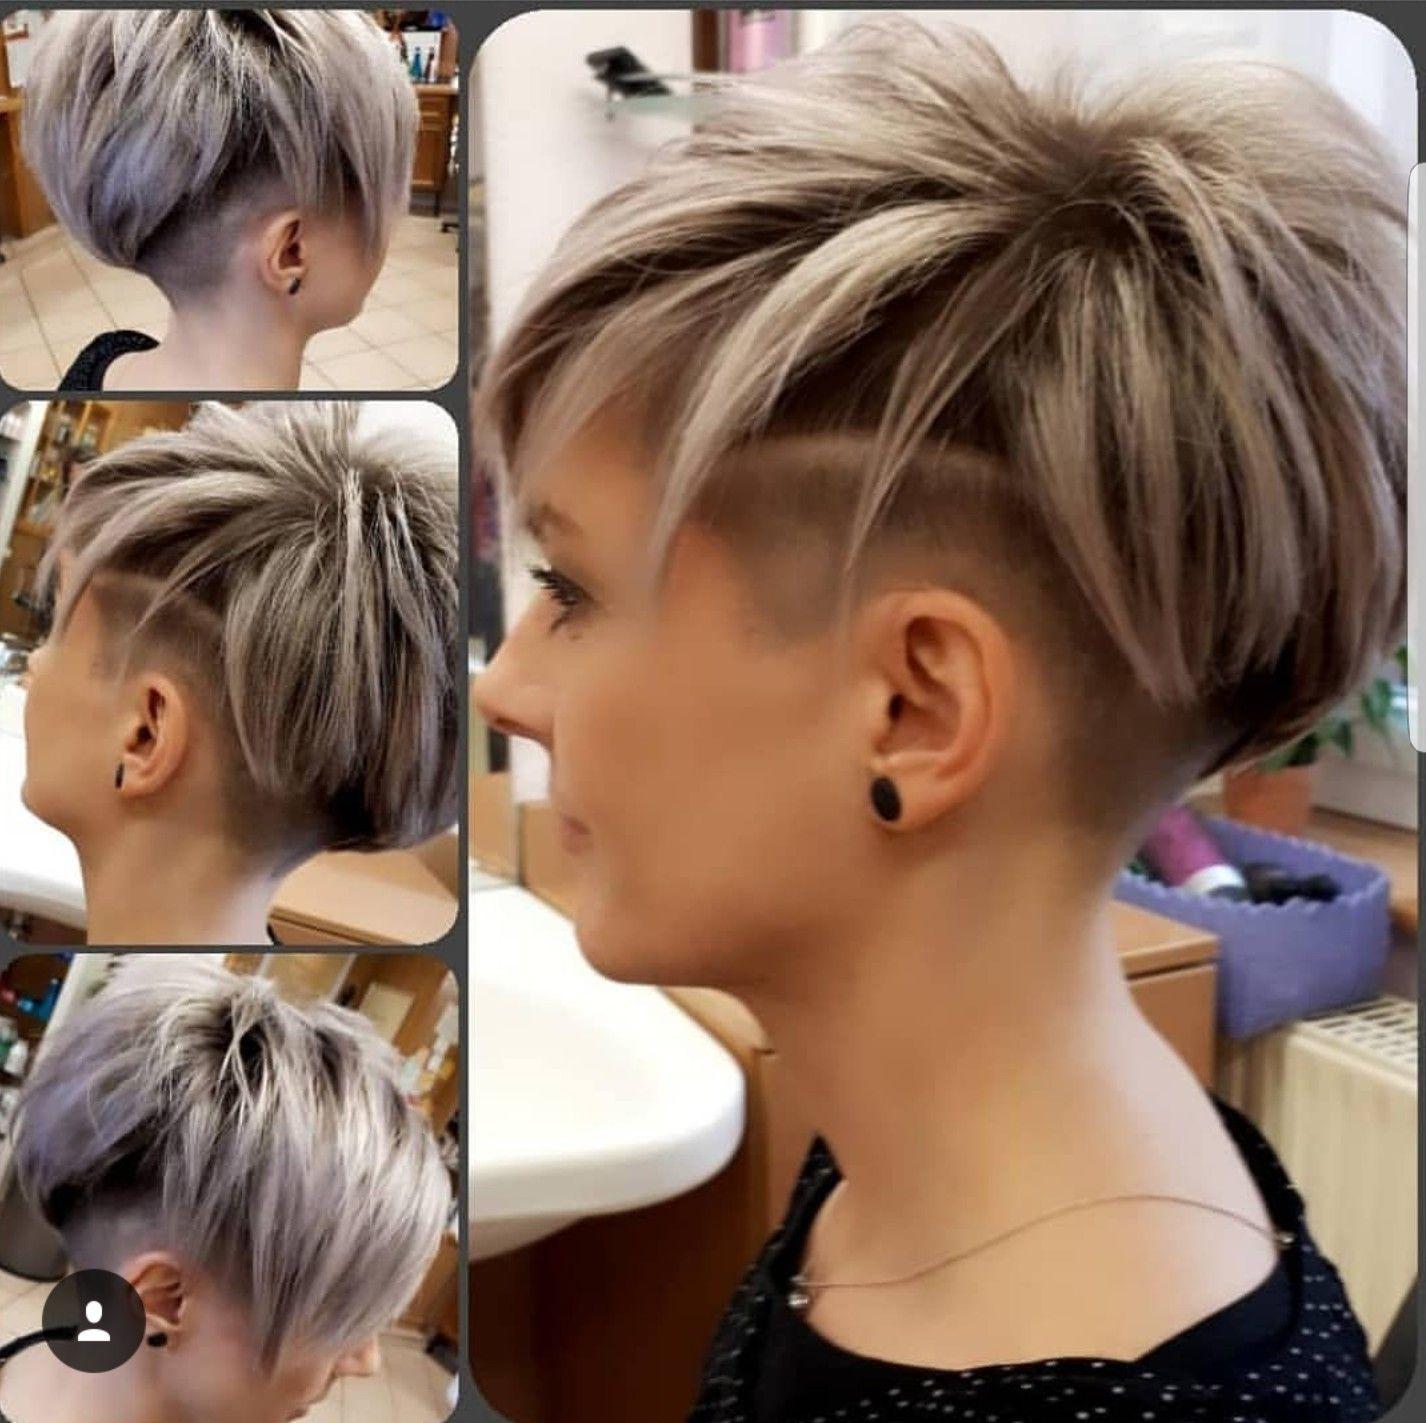 Pin Von Lopi Pals Auf Coiffure Schone Frisuren Kurze Haare Kurzhaarschnitte Kurzhaarfrisuren